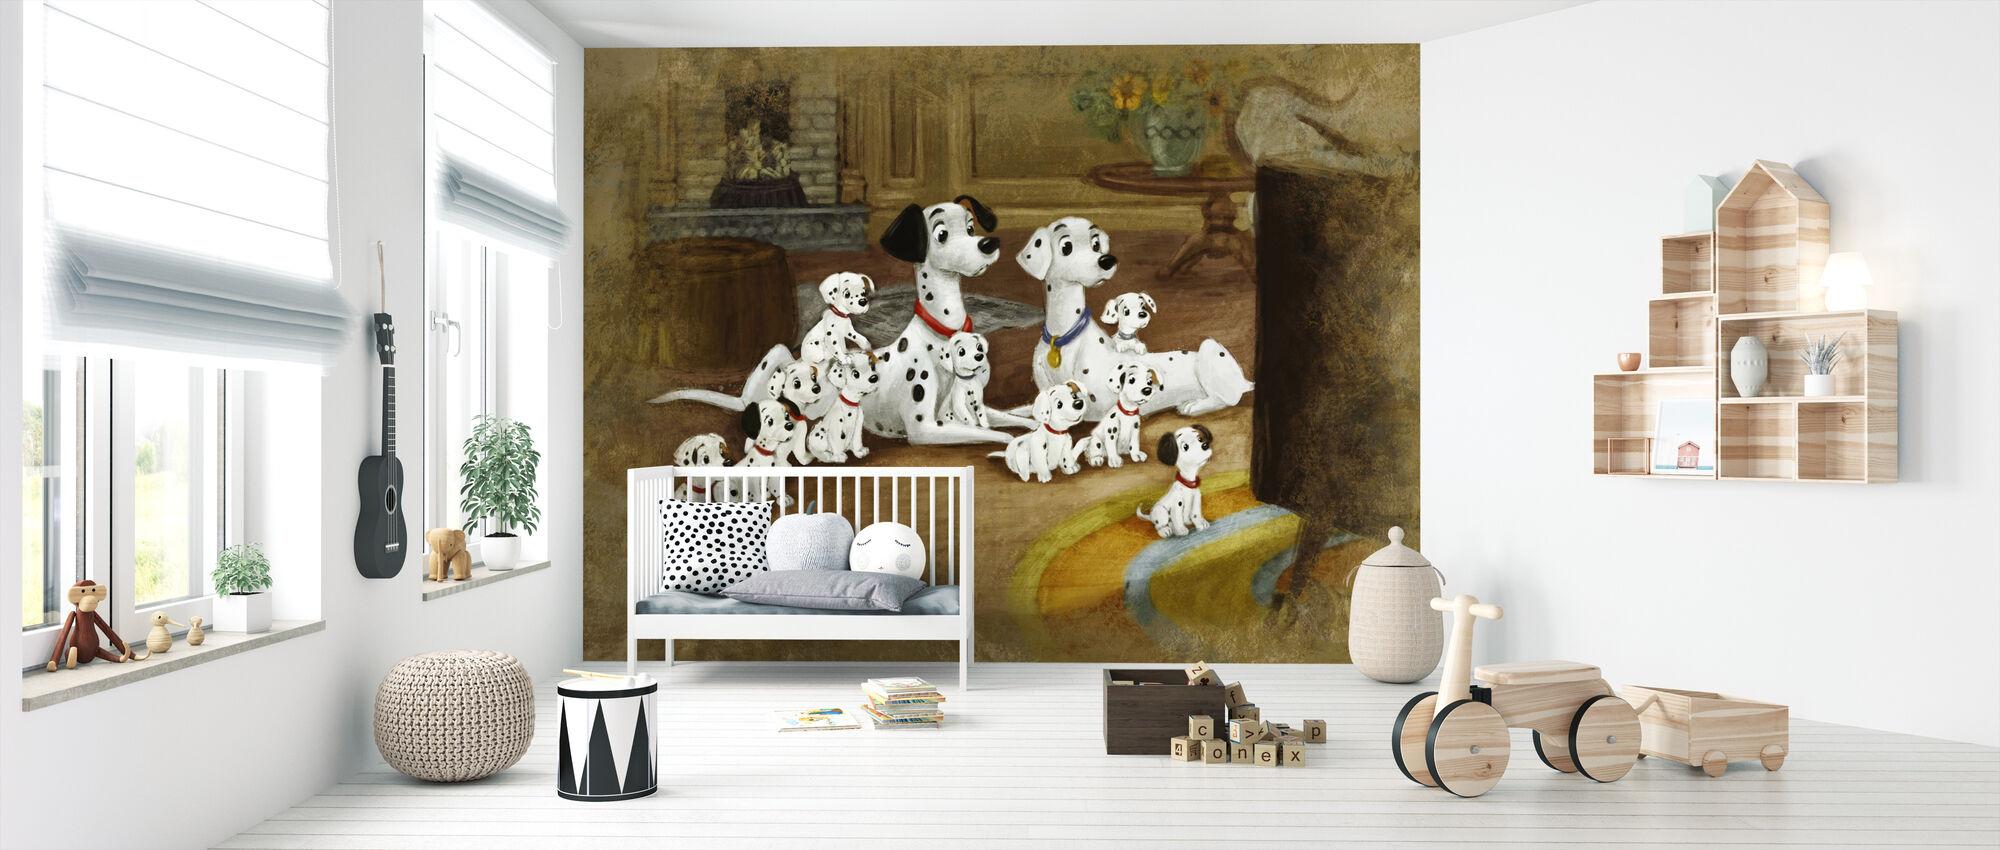 Disney Classics - 101 Dalmatians - Tapetti - Vauvan huone